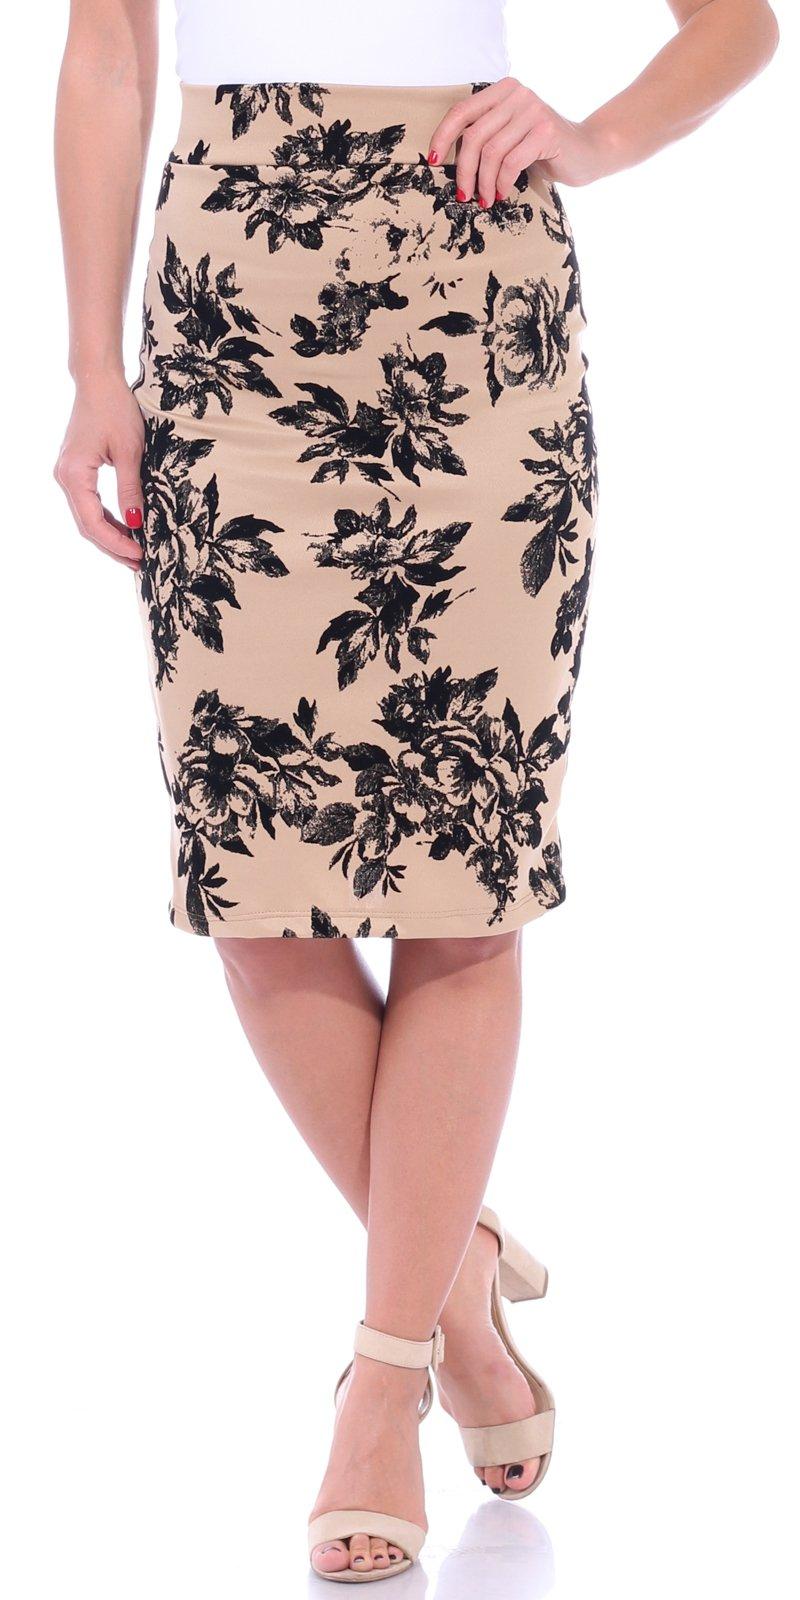 Popana Women's Stretch Pencil Skirt Knee Length High Waist for Work Made in USA Medium Cream by Popana